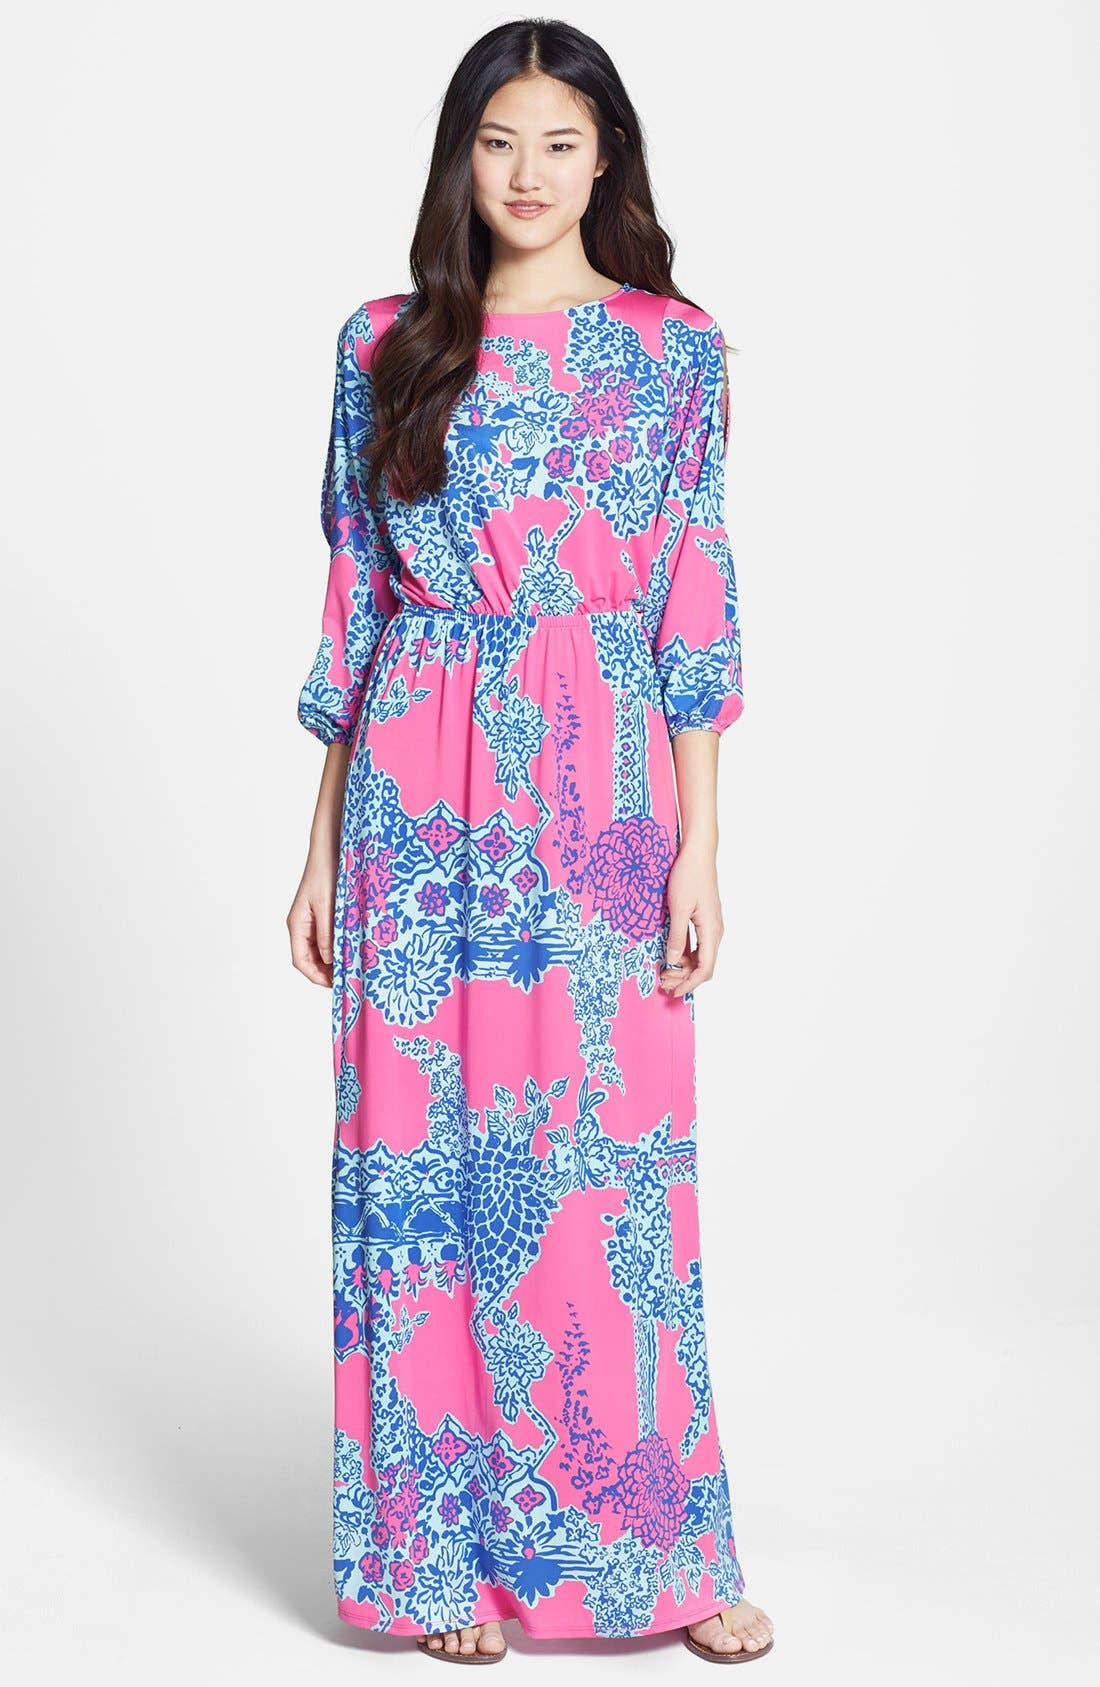 Alternate Image 1 Selected - Lilly Pulitzer® 'Ashlynn' Print Jersey Maxi Dress